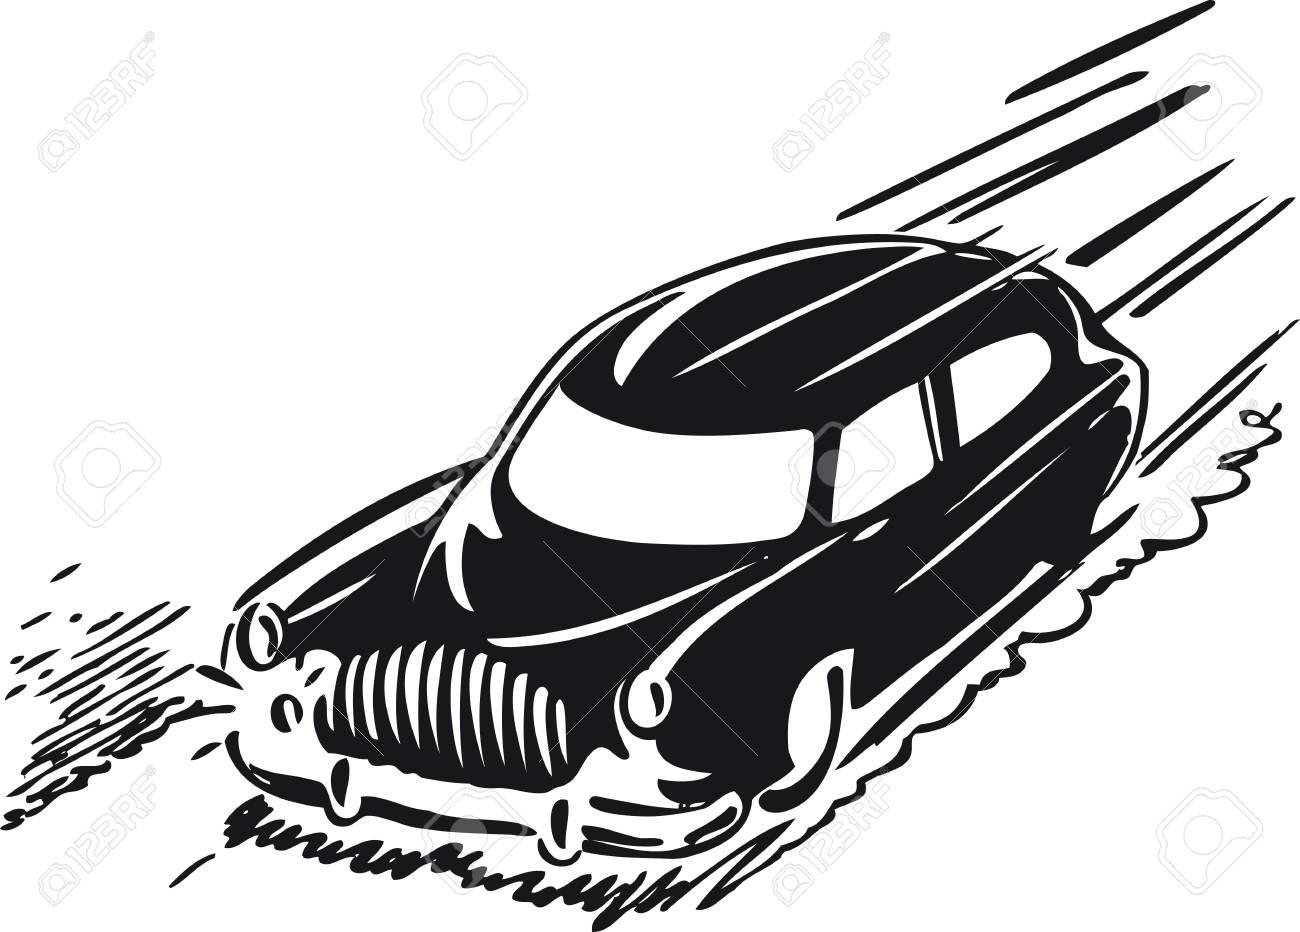 Fast car, Retro Vector Illustration.